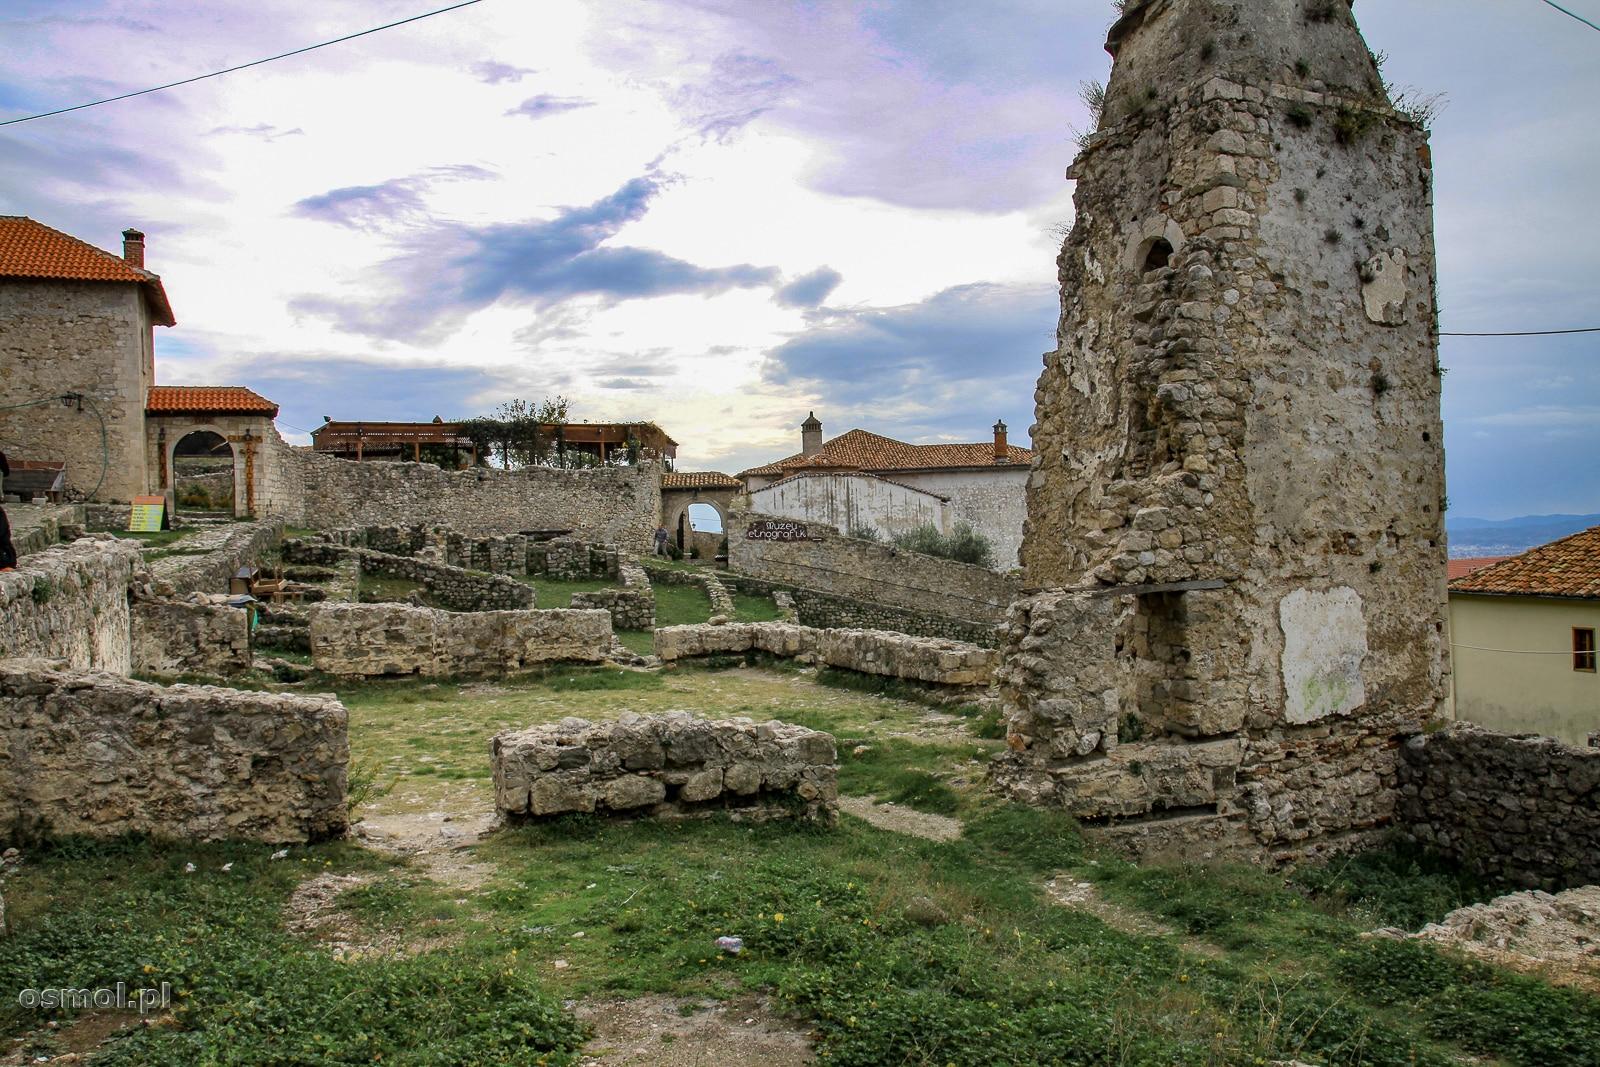 Ruiny zamku w Kruji.